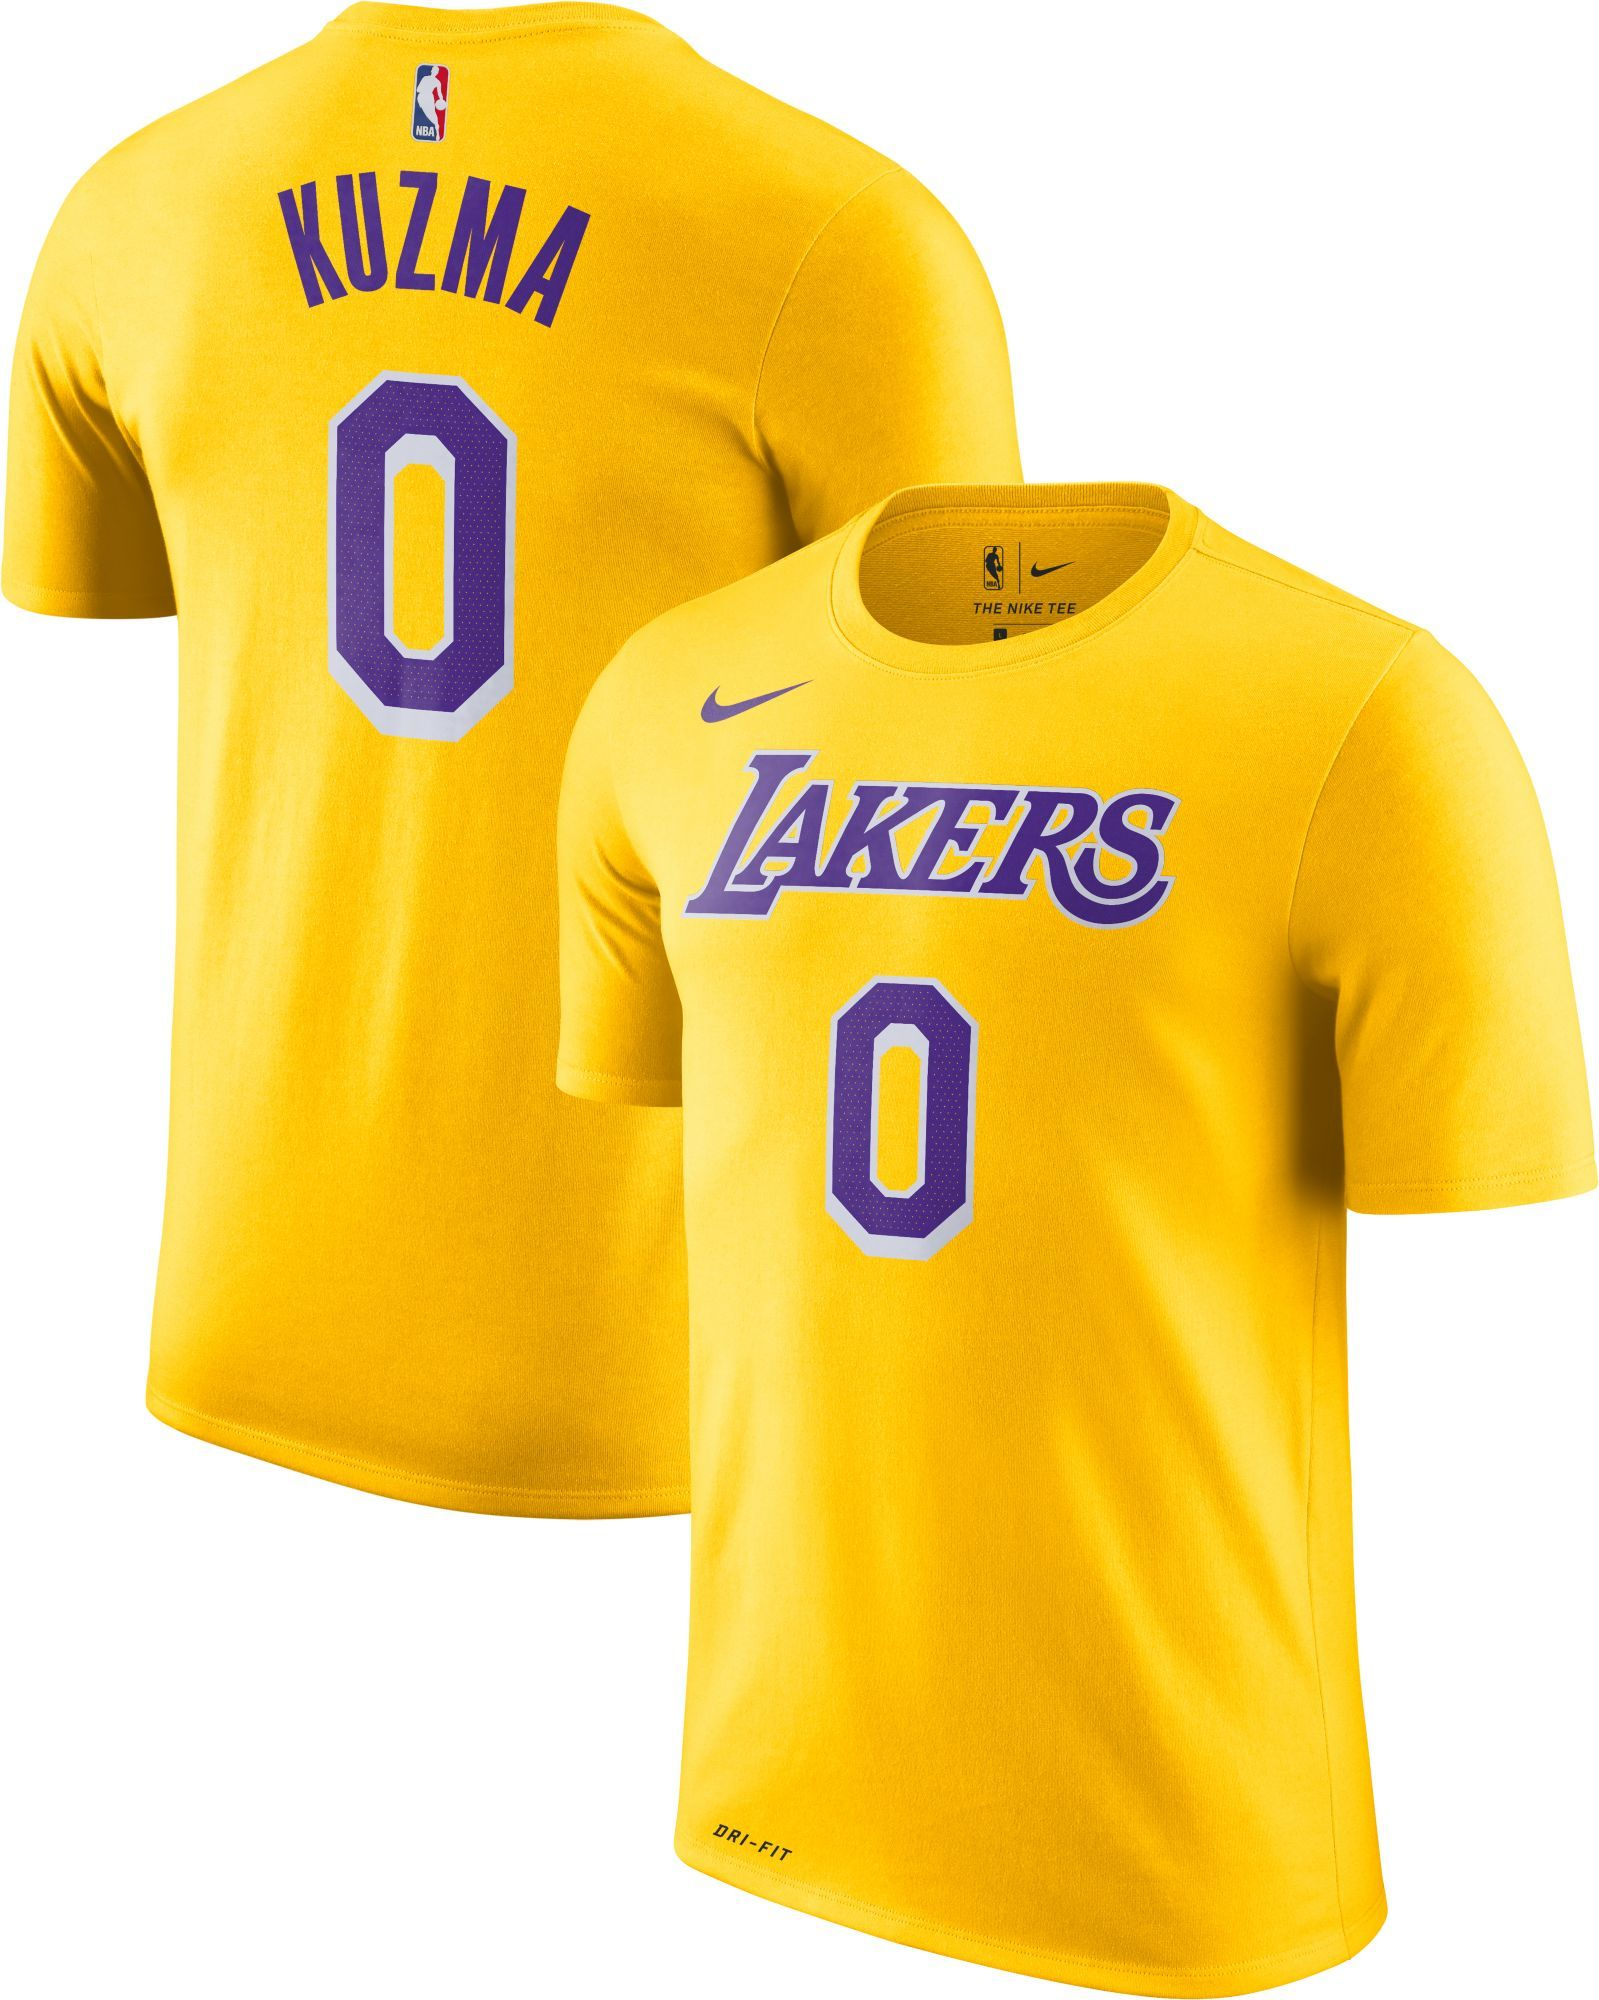 newest b0e5e 1c392 Nike Youth Los Angeles Lakers Kyle Kuzma #0 Dri-FIT Gold T ...